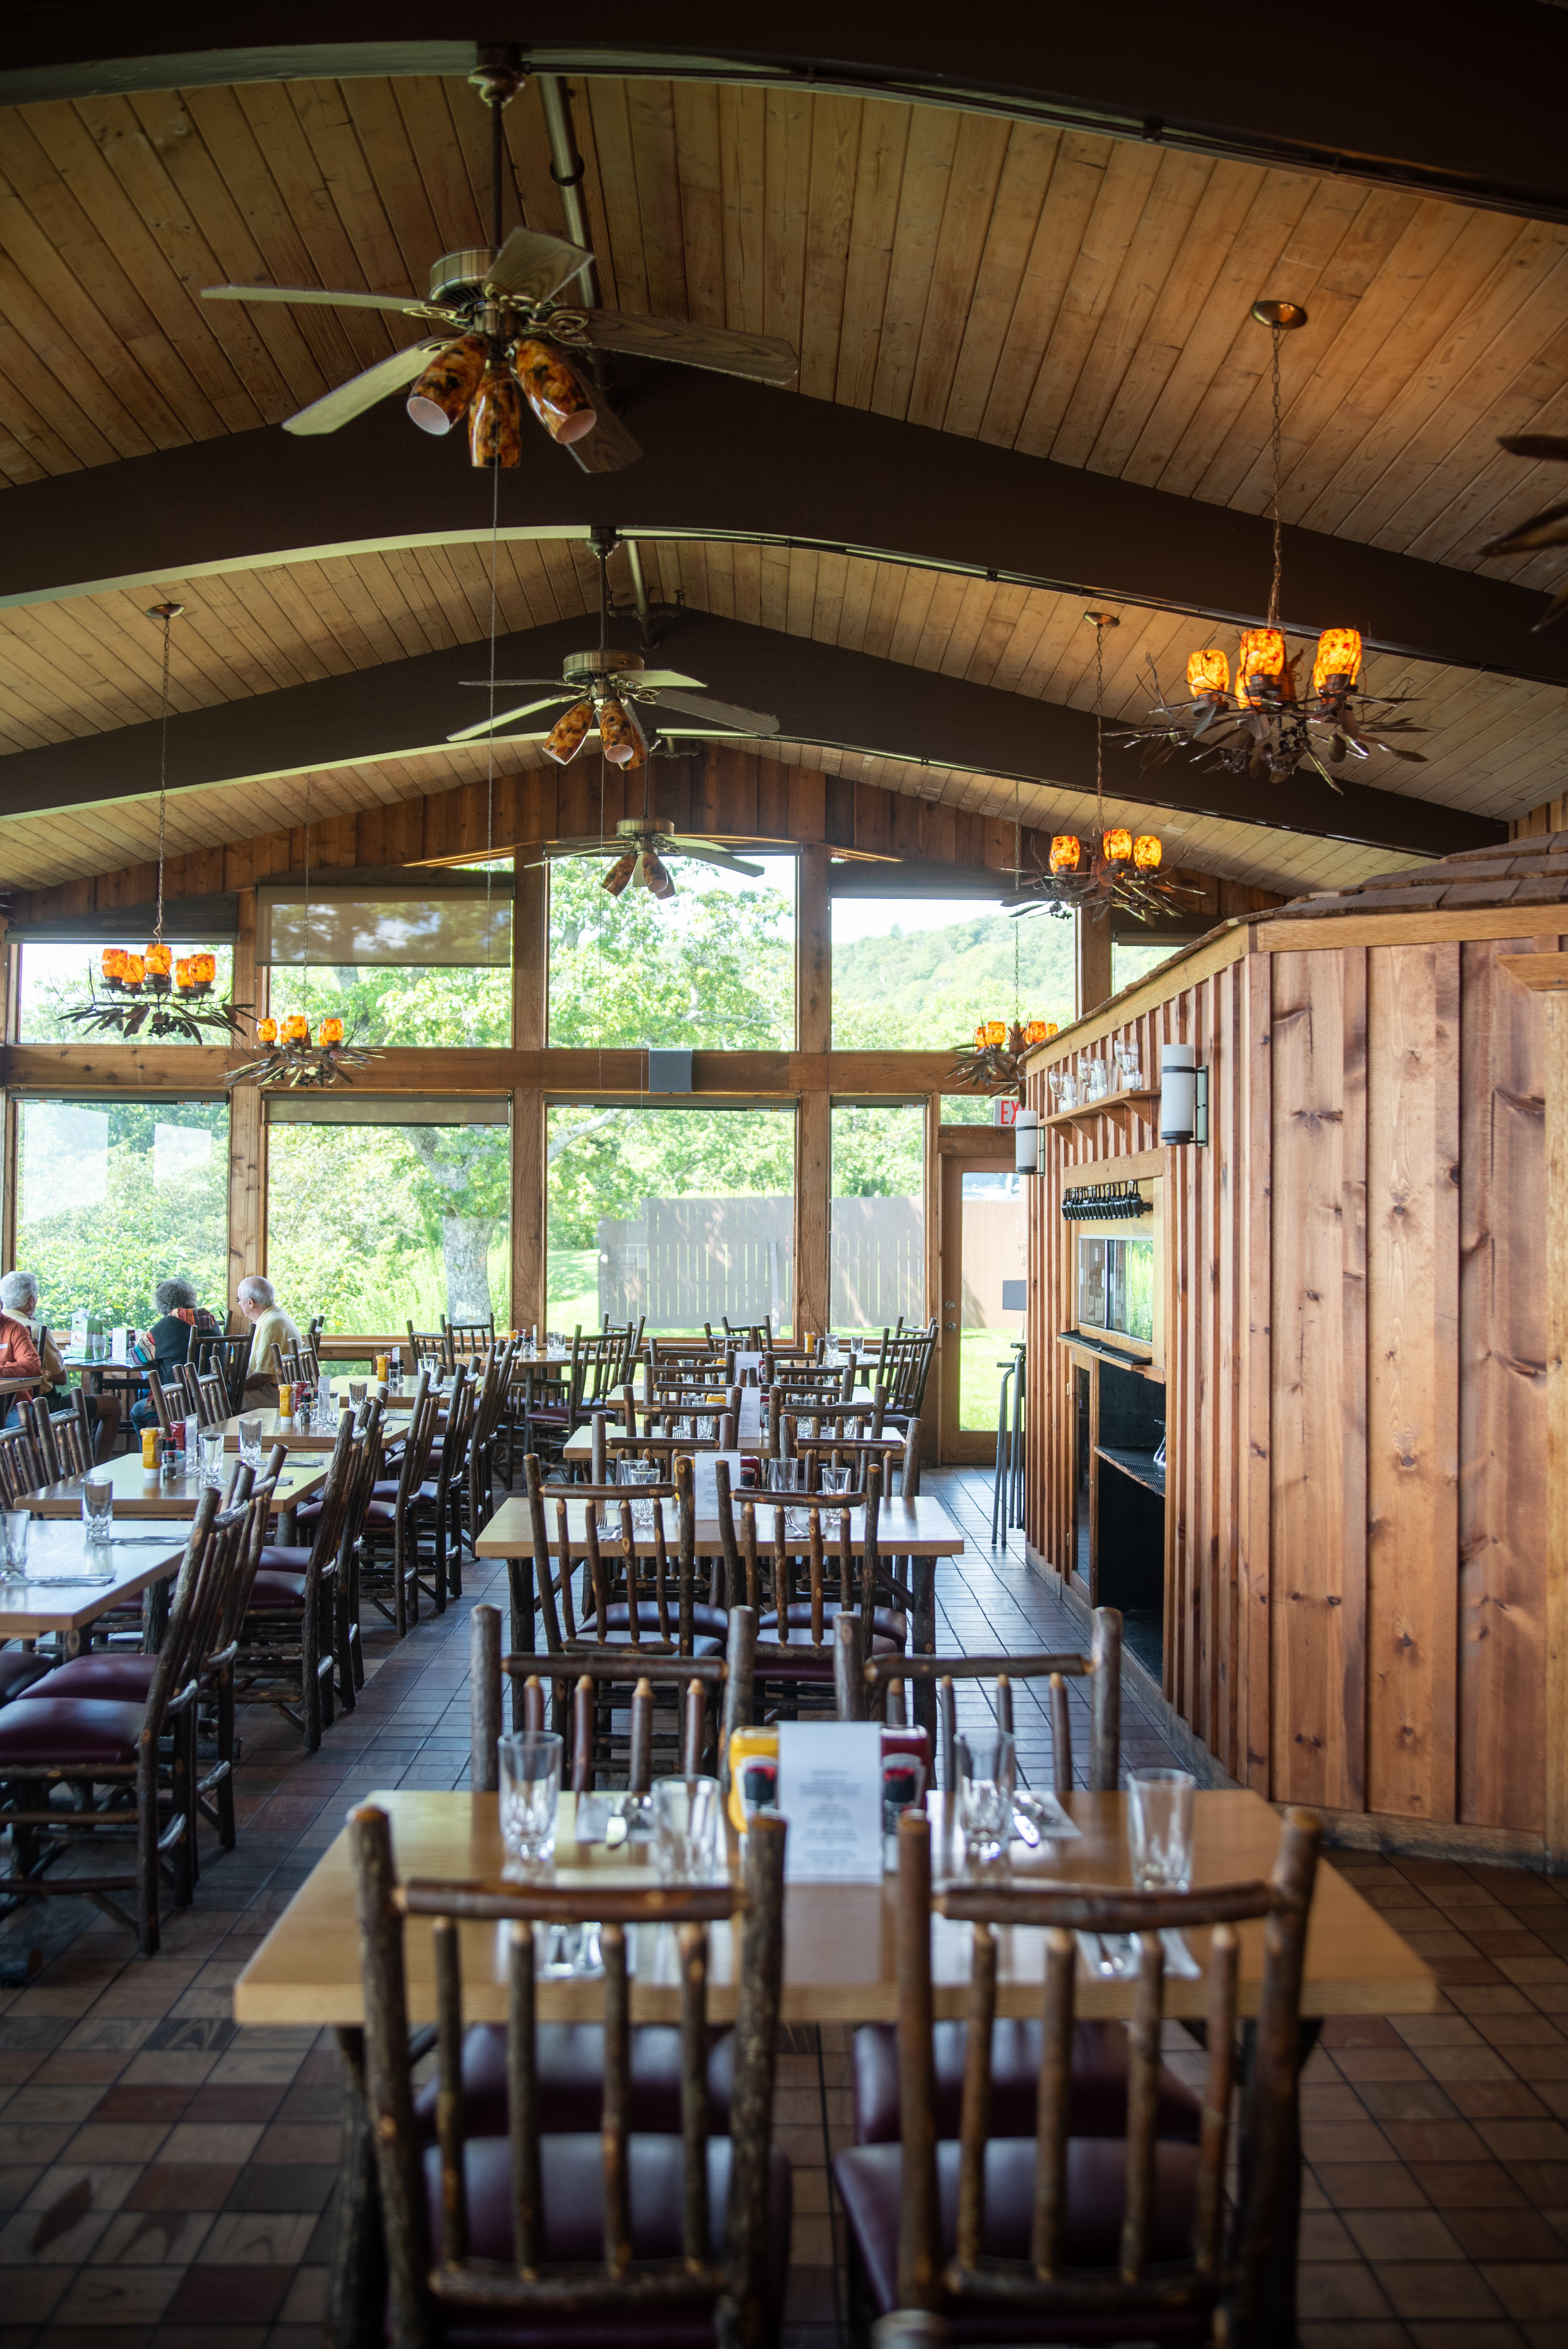 Dining area of the Pisgah Inn on Blue Ridge Parkway